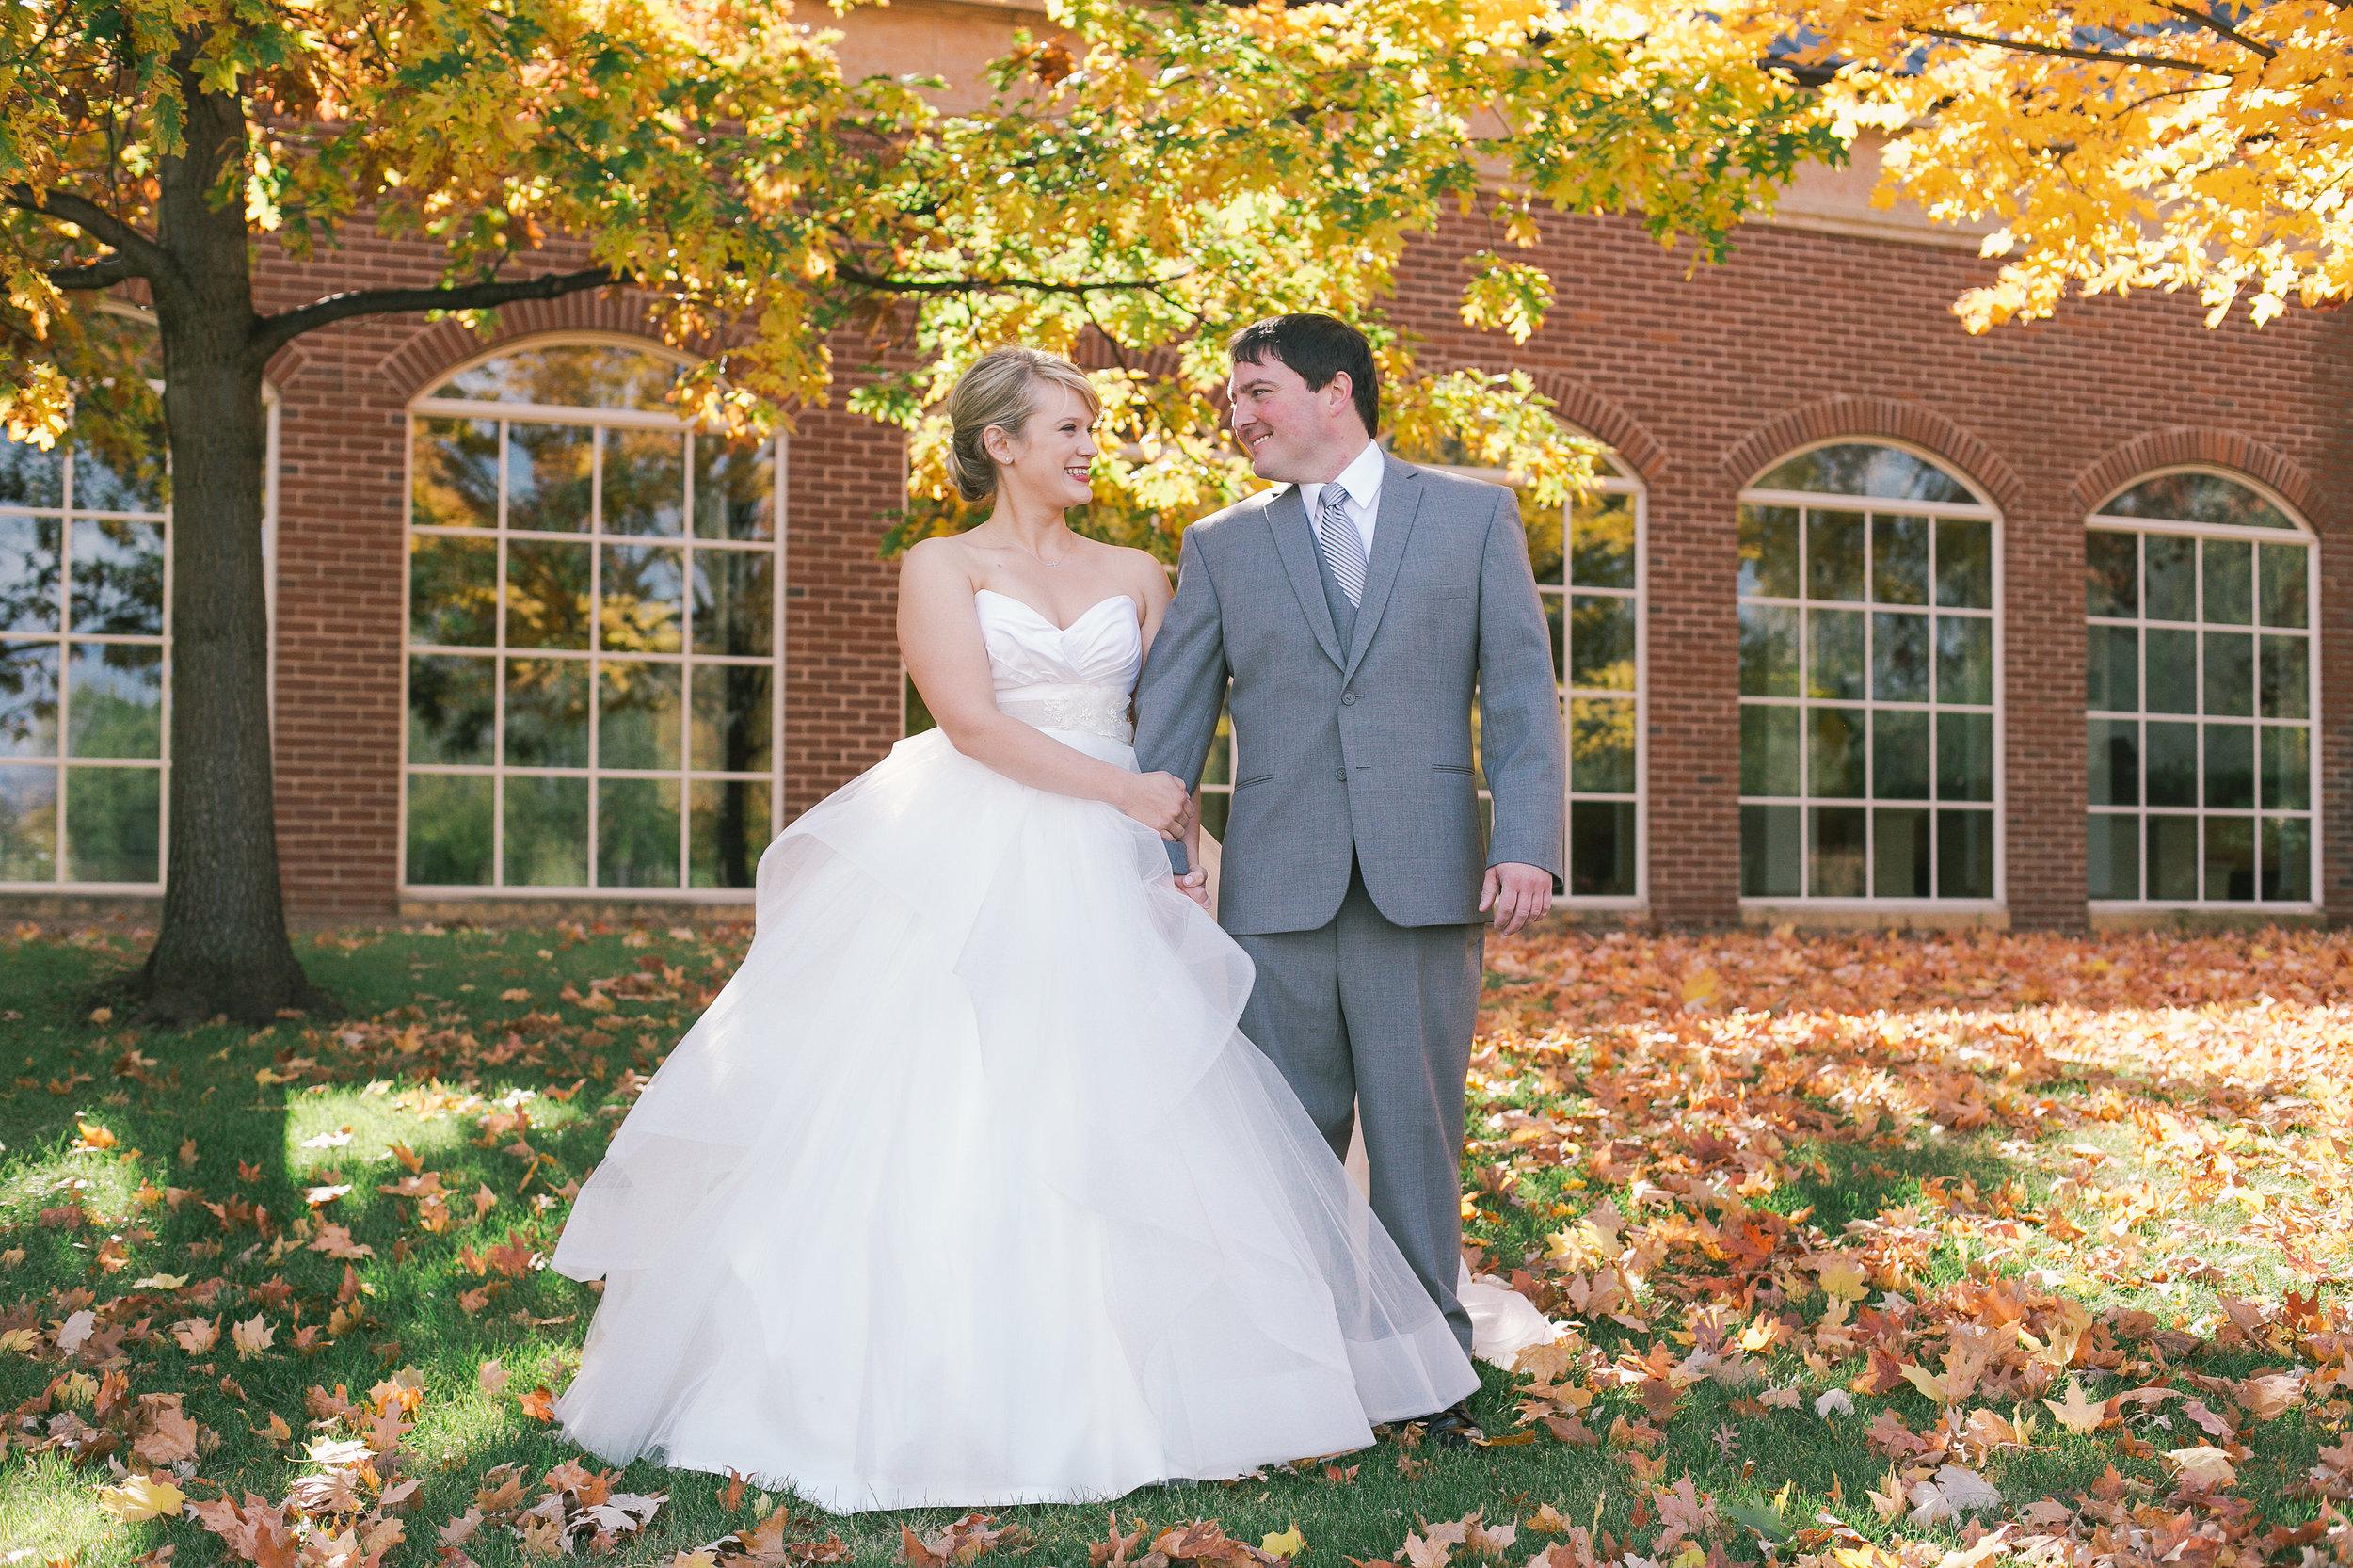 kim-nate-wedding-98 - Copy.jpg